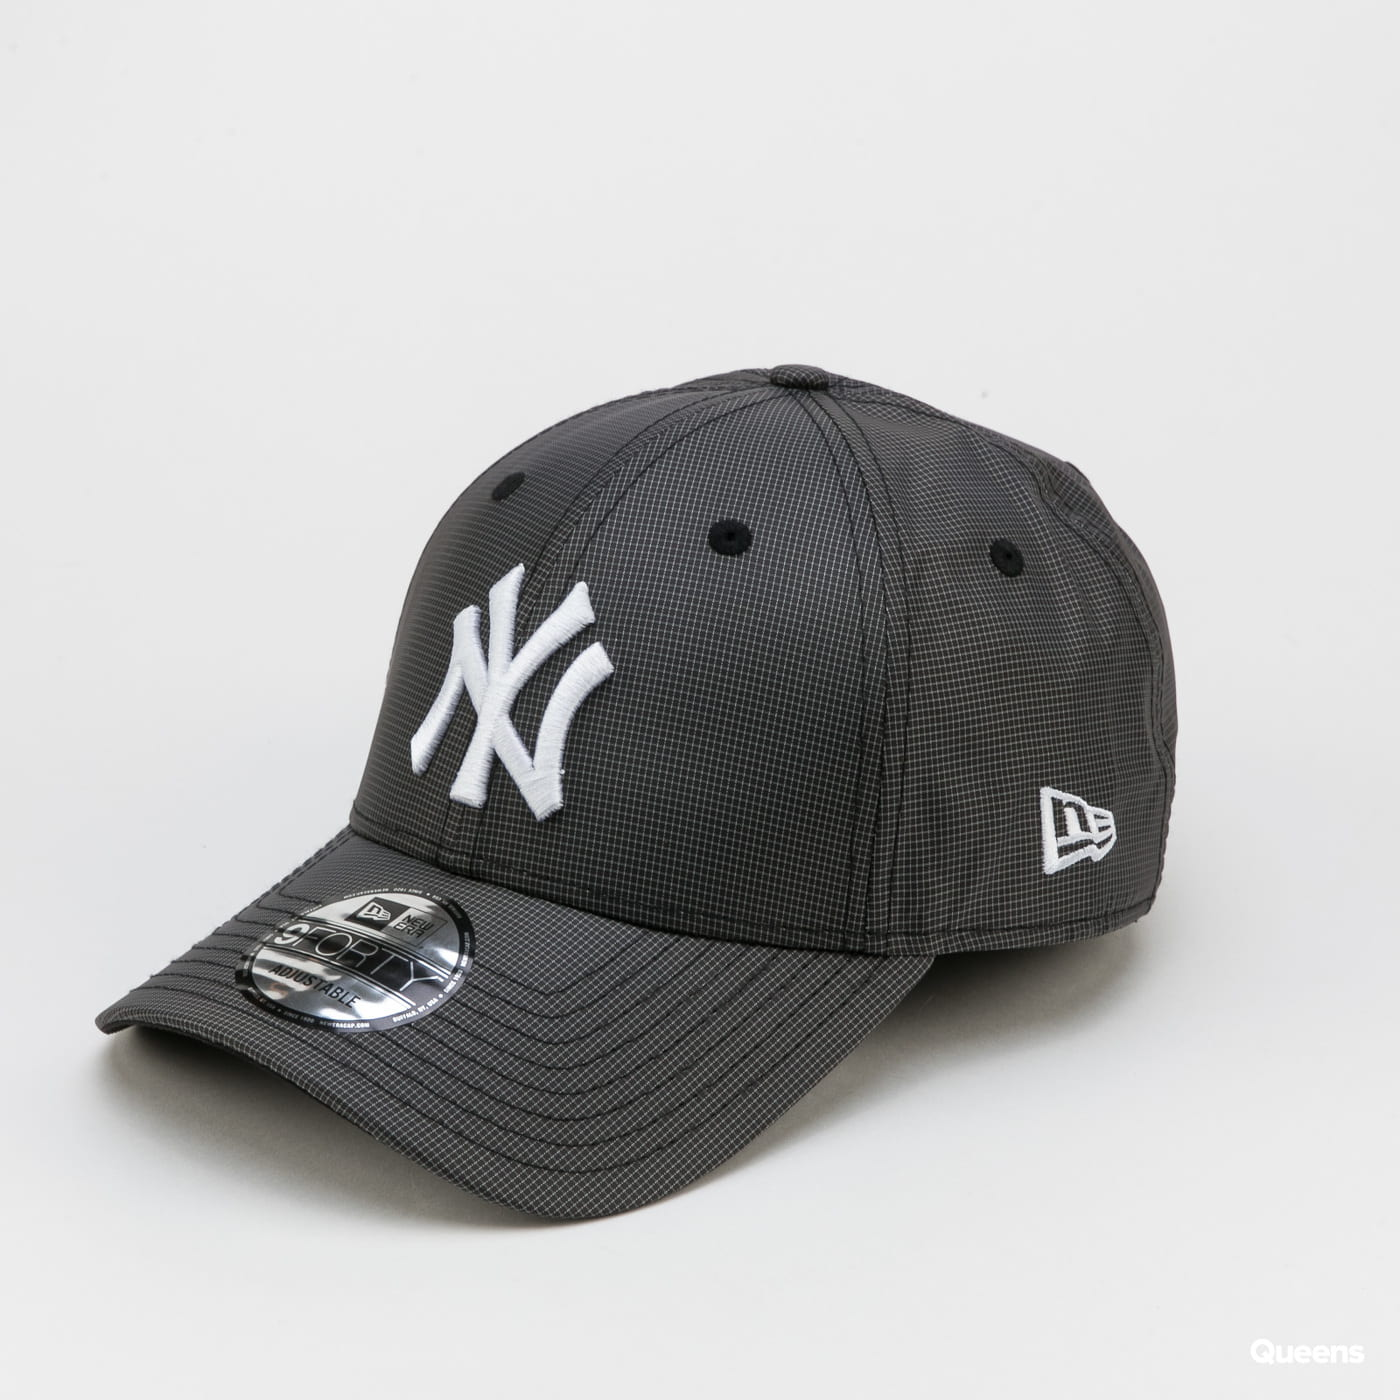 New Era 940 MLB Team Ripstop LA dark gray